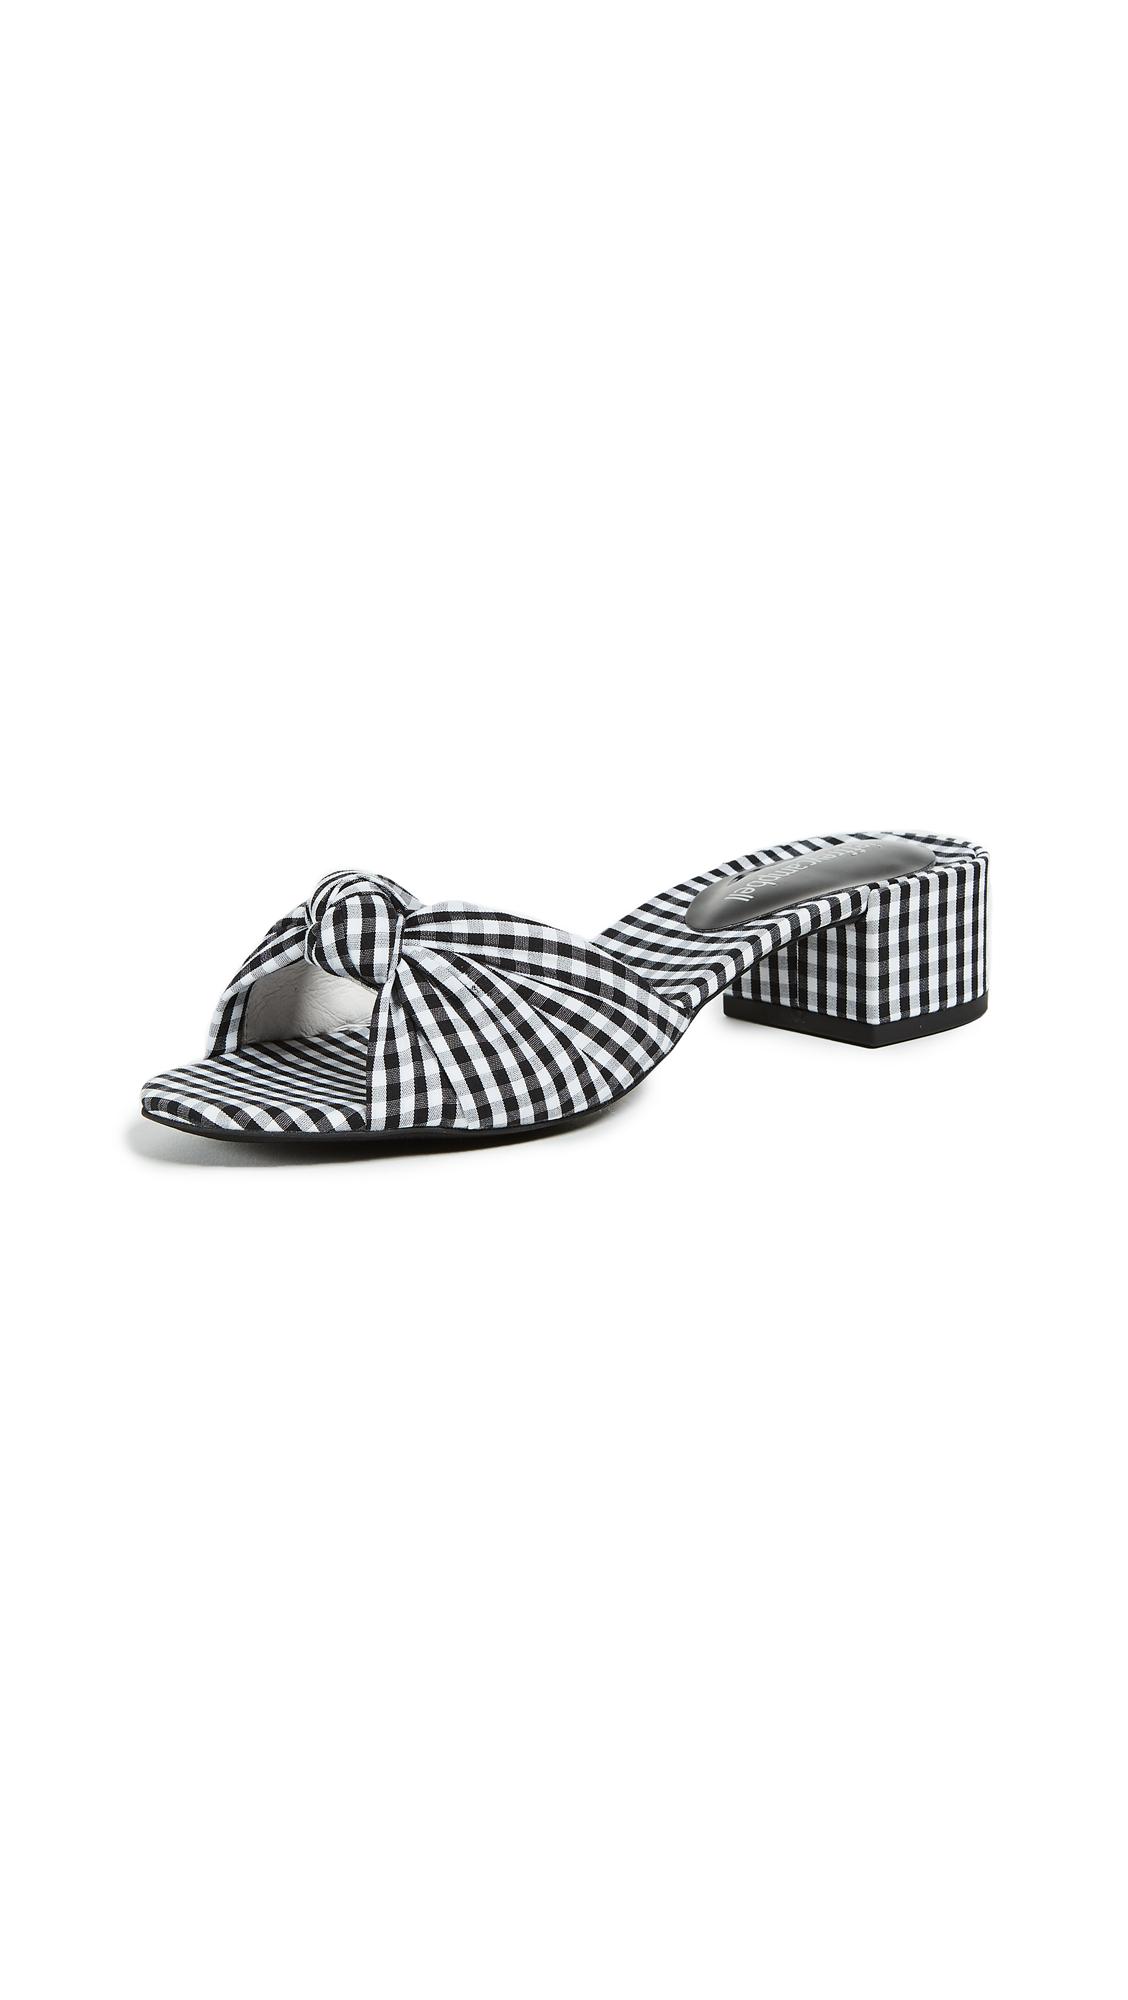 Jeffrey Campbell Beaton Gingham Slides - Black/White